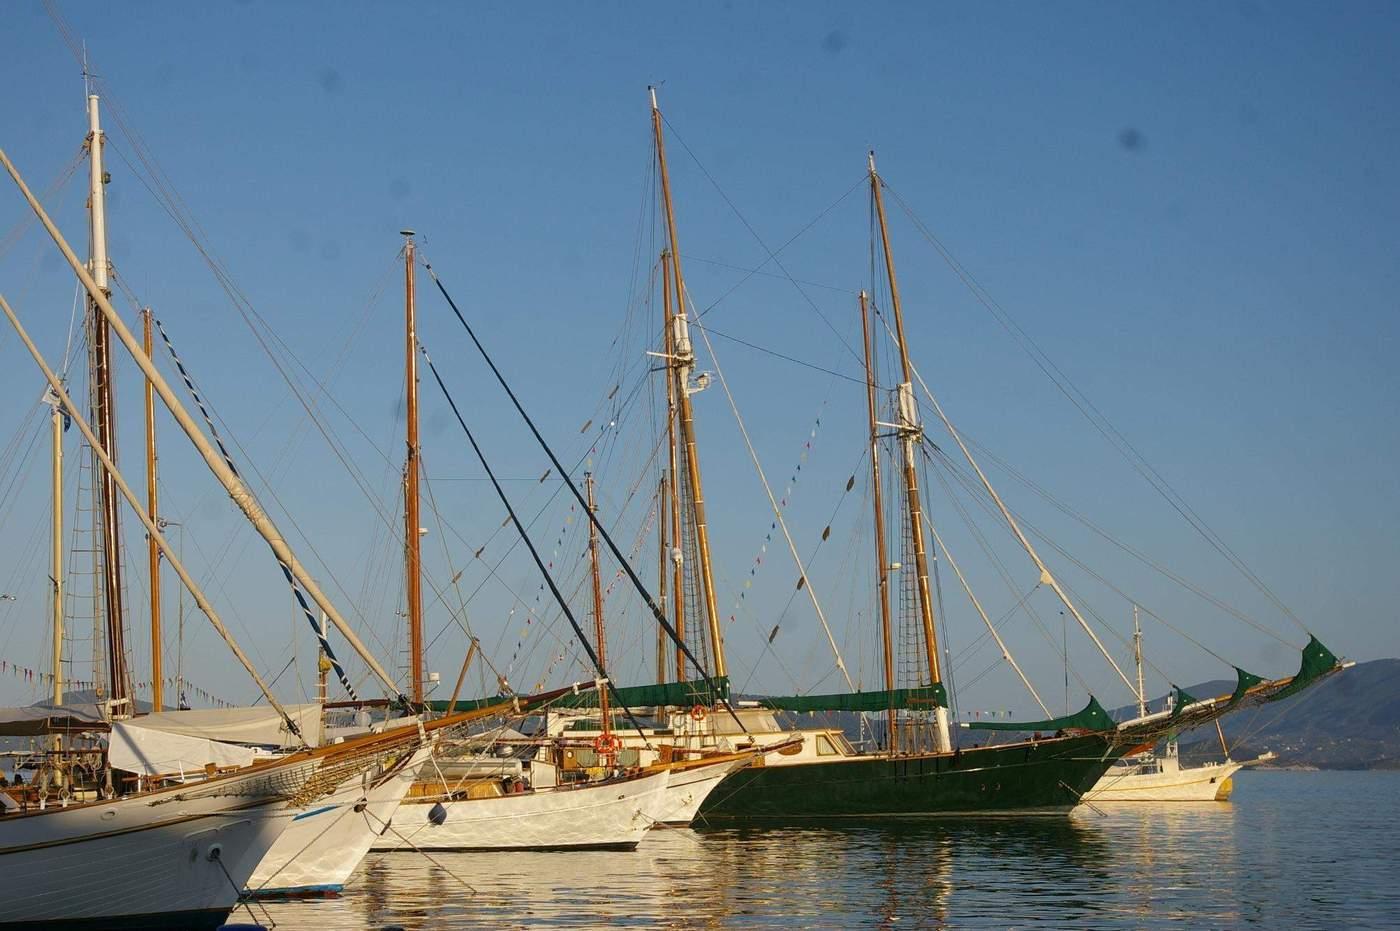 traditionalboats